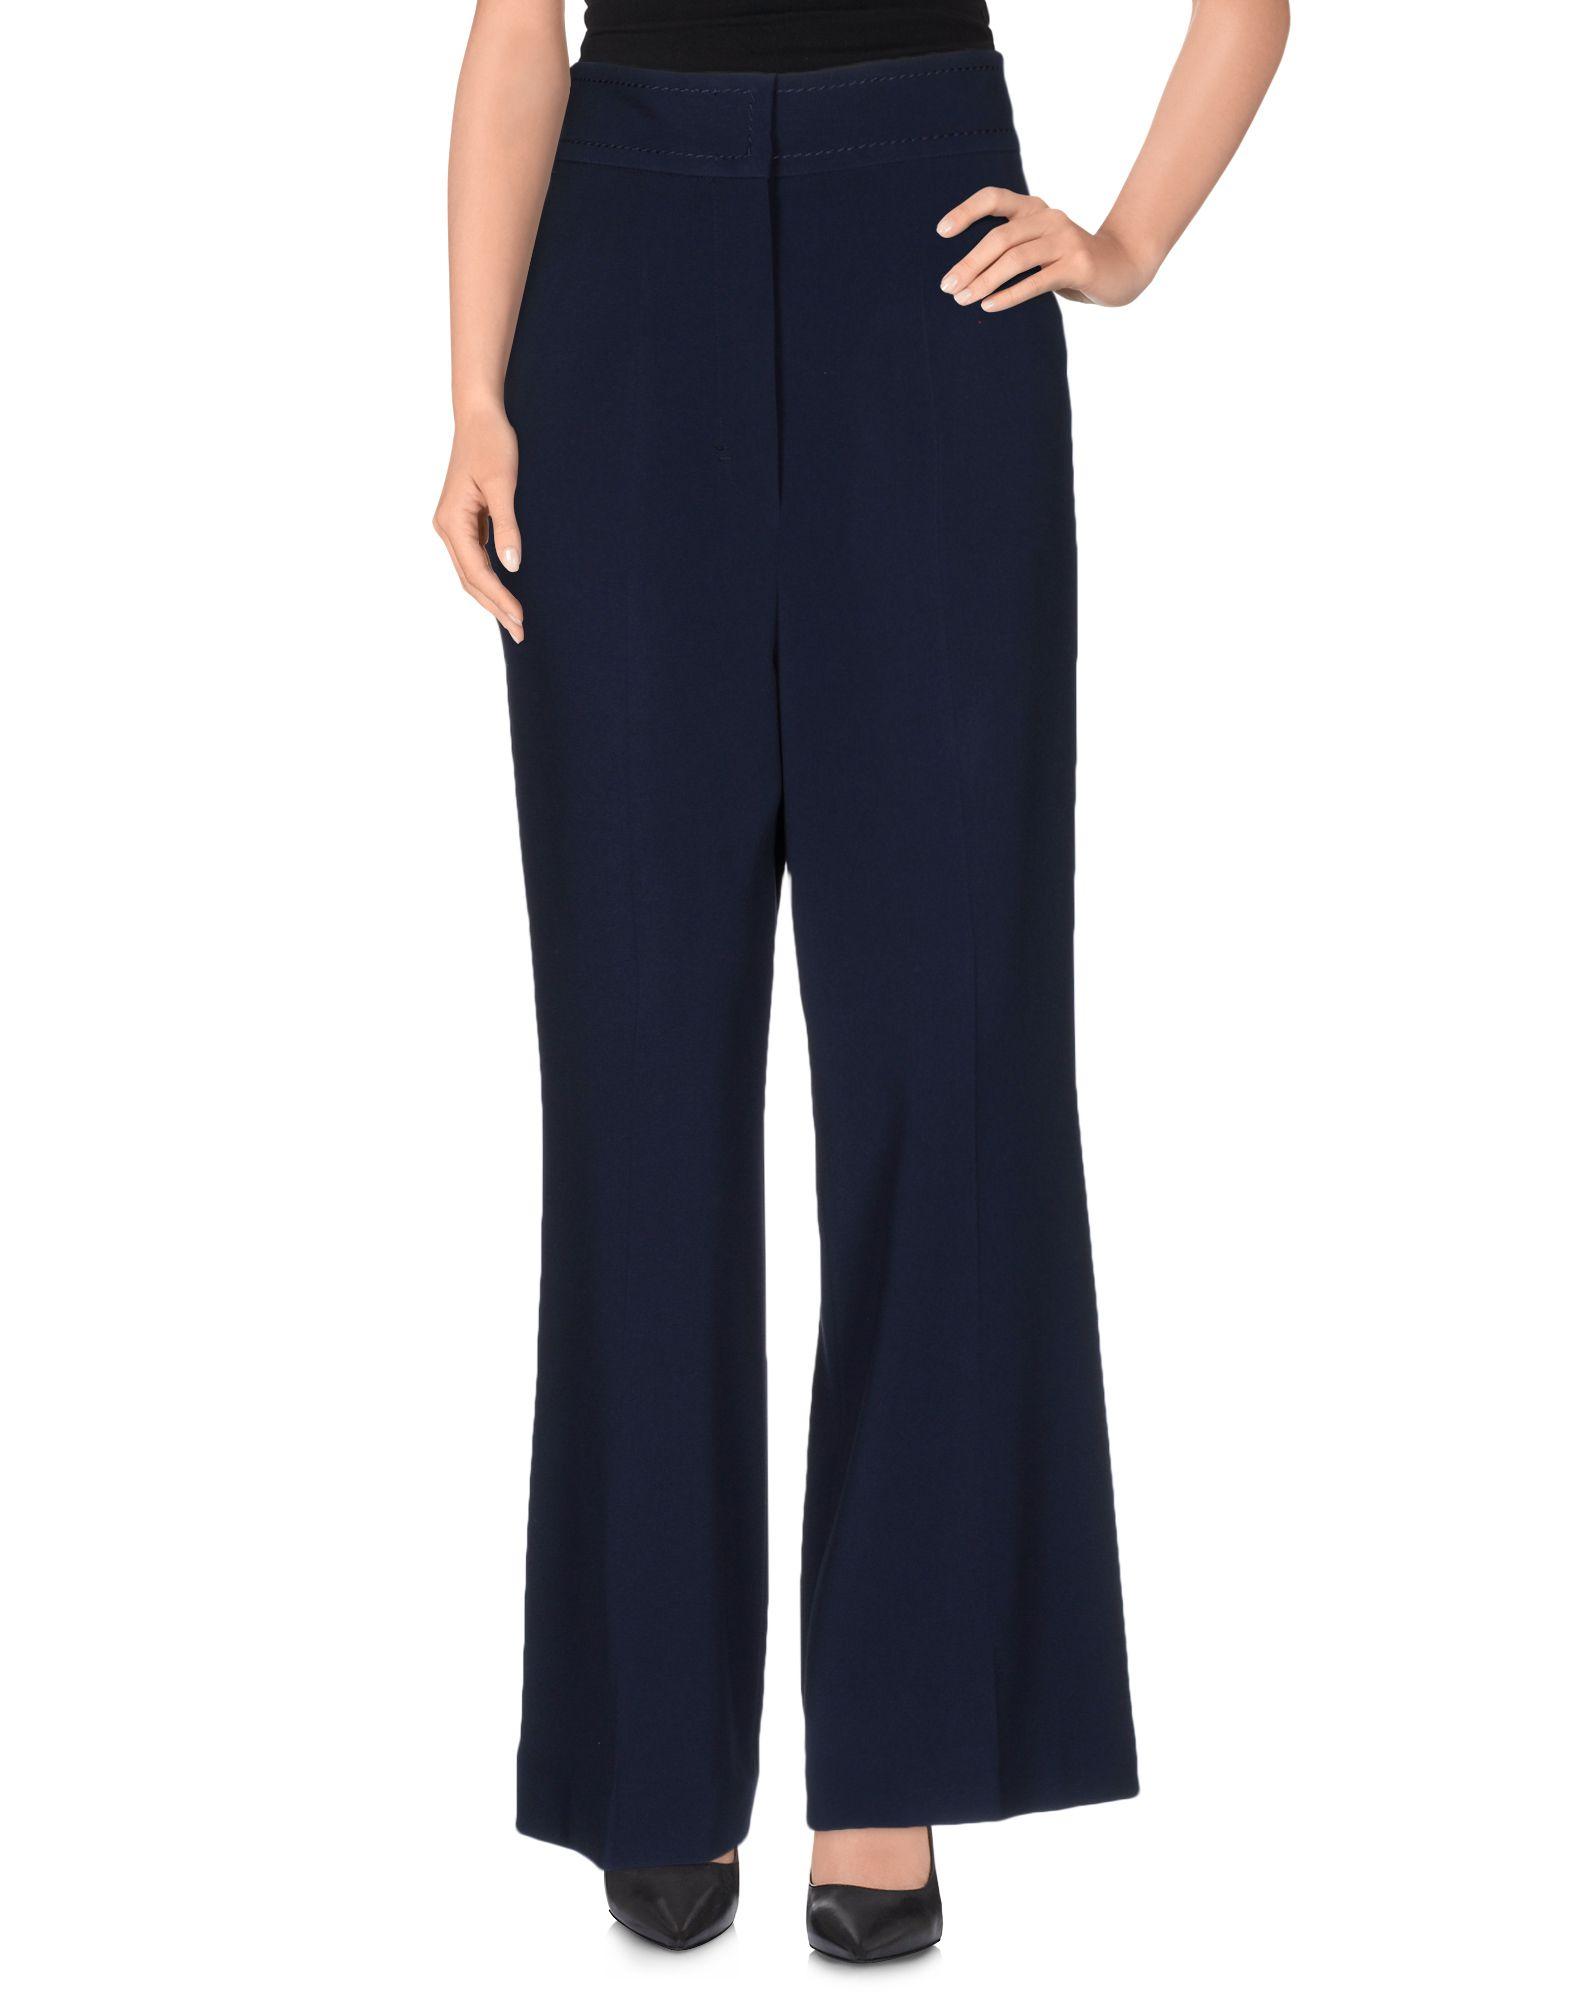 SPORTMAX Damen Hose Farbe Blau Größe 3